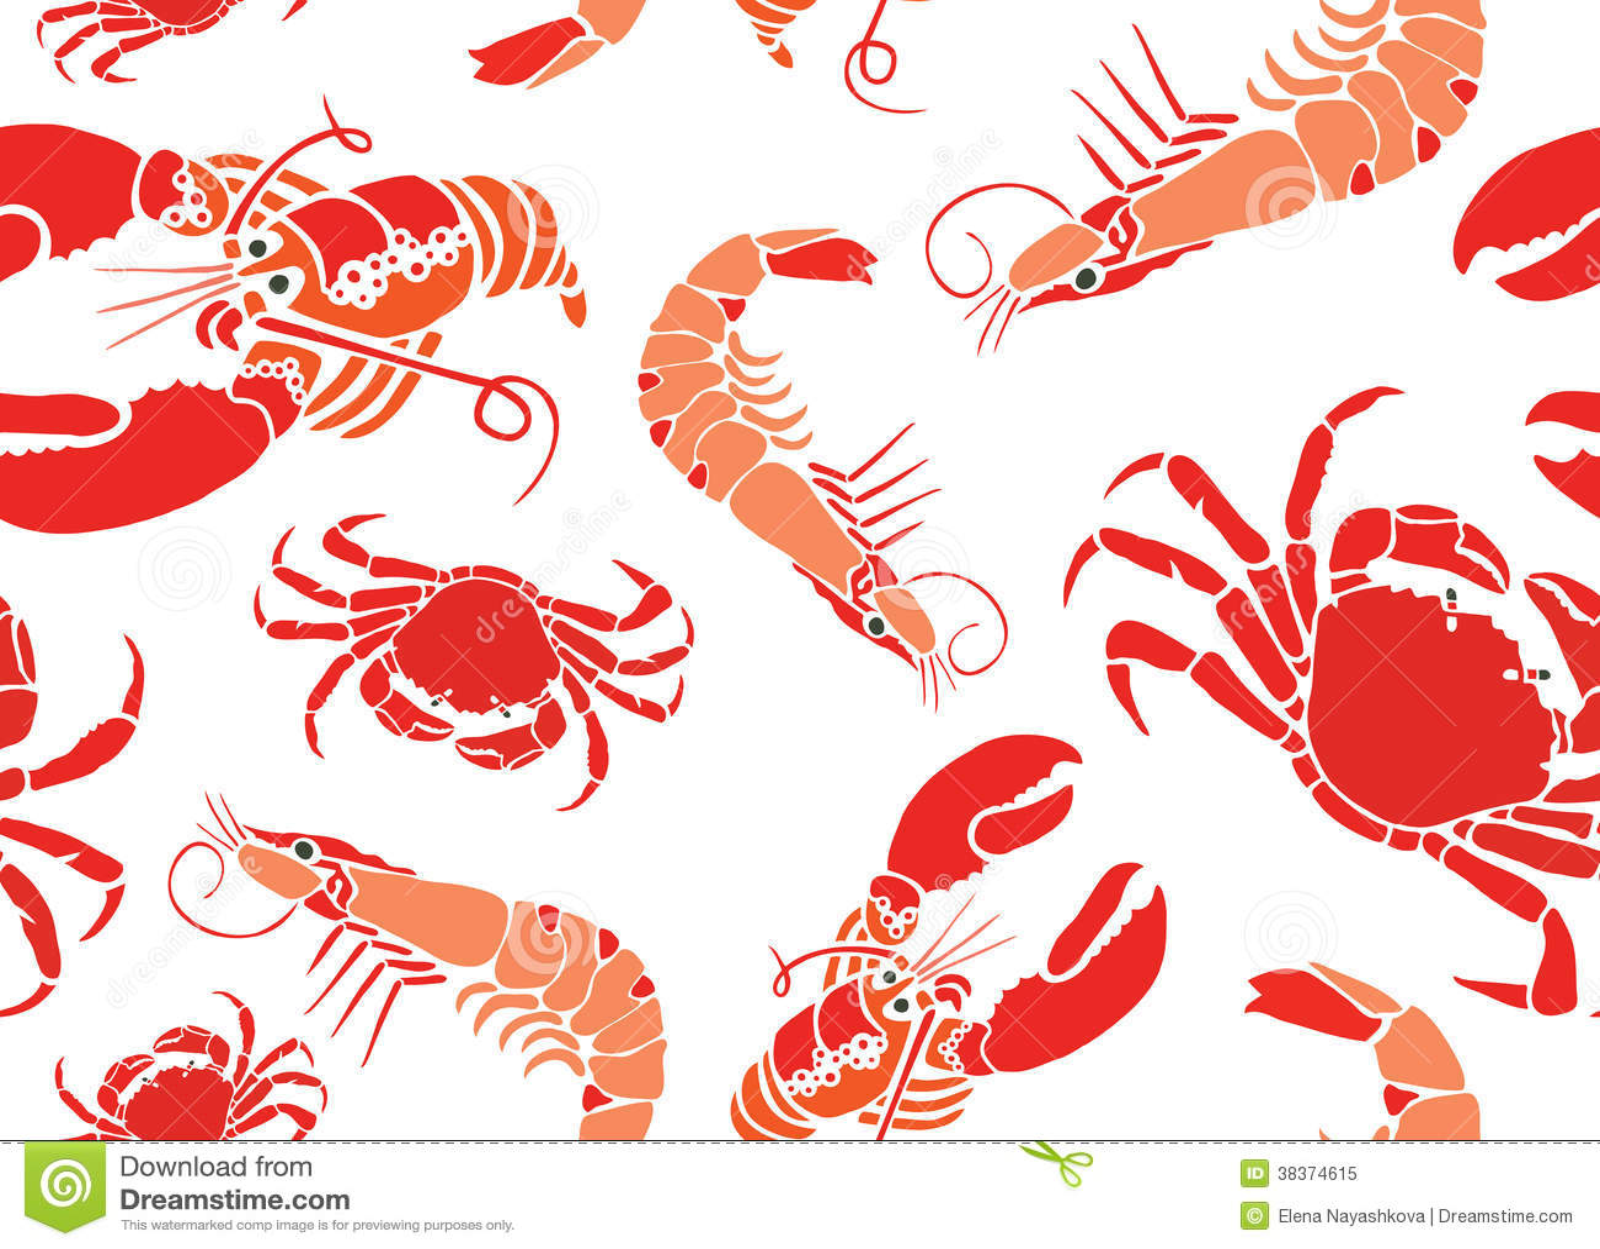 Cool Seafood Seamless Pattern Stock Illustration - Image ...